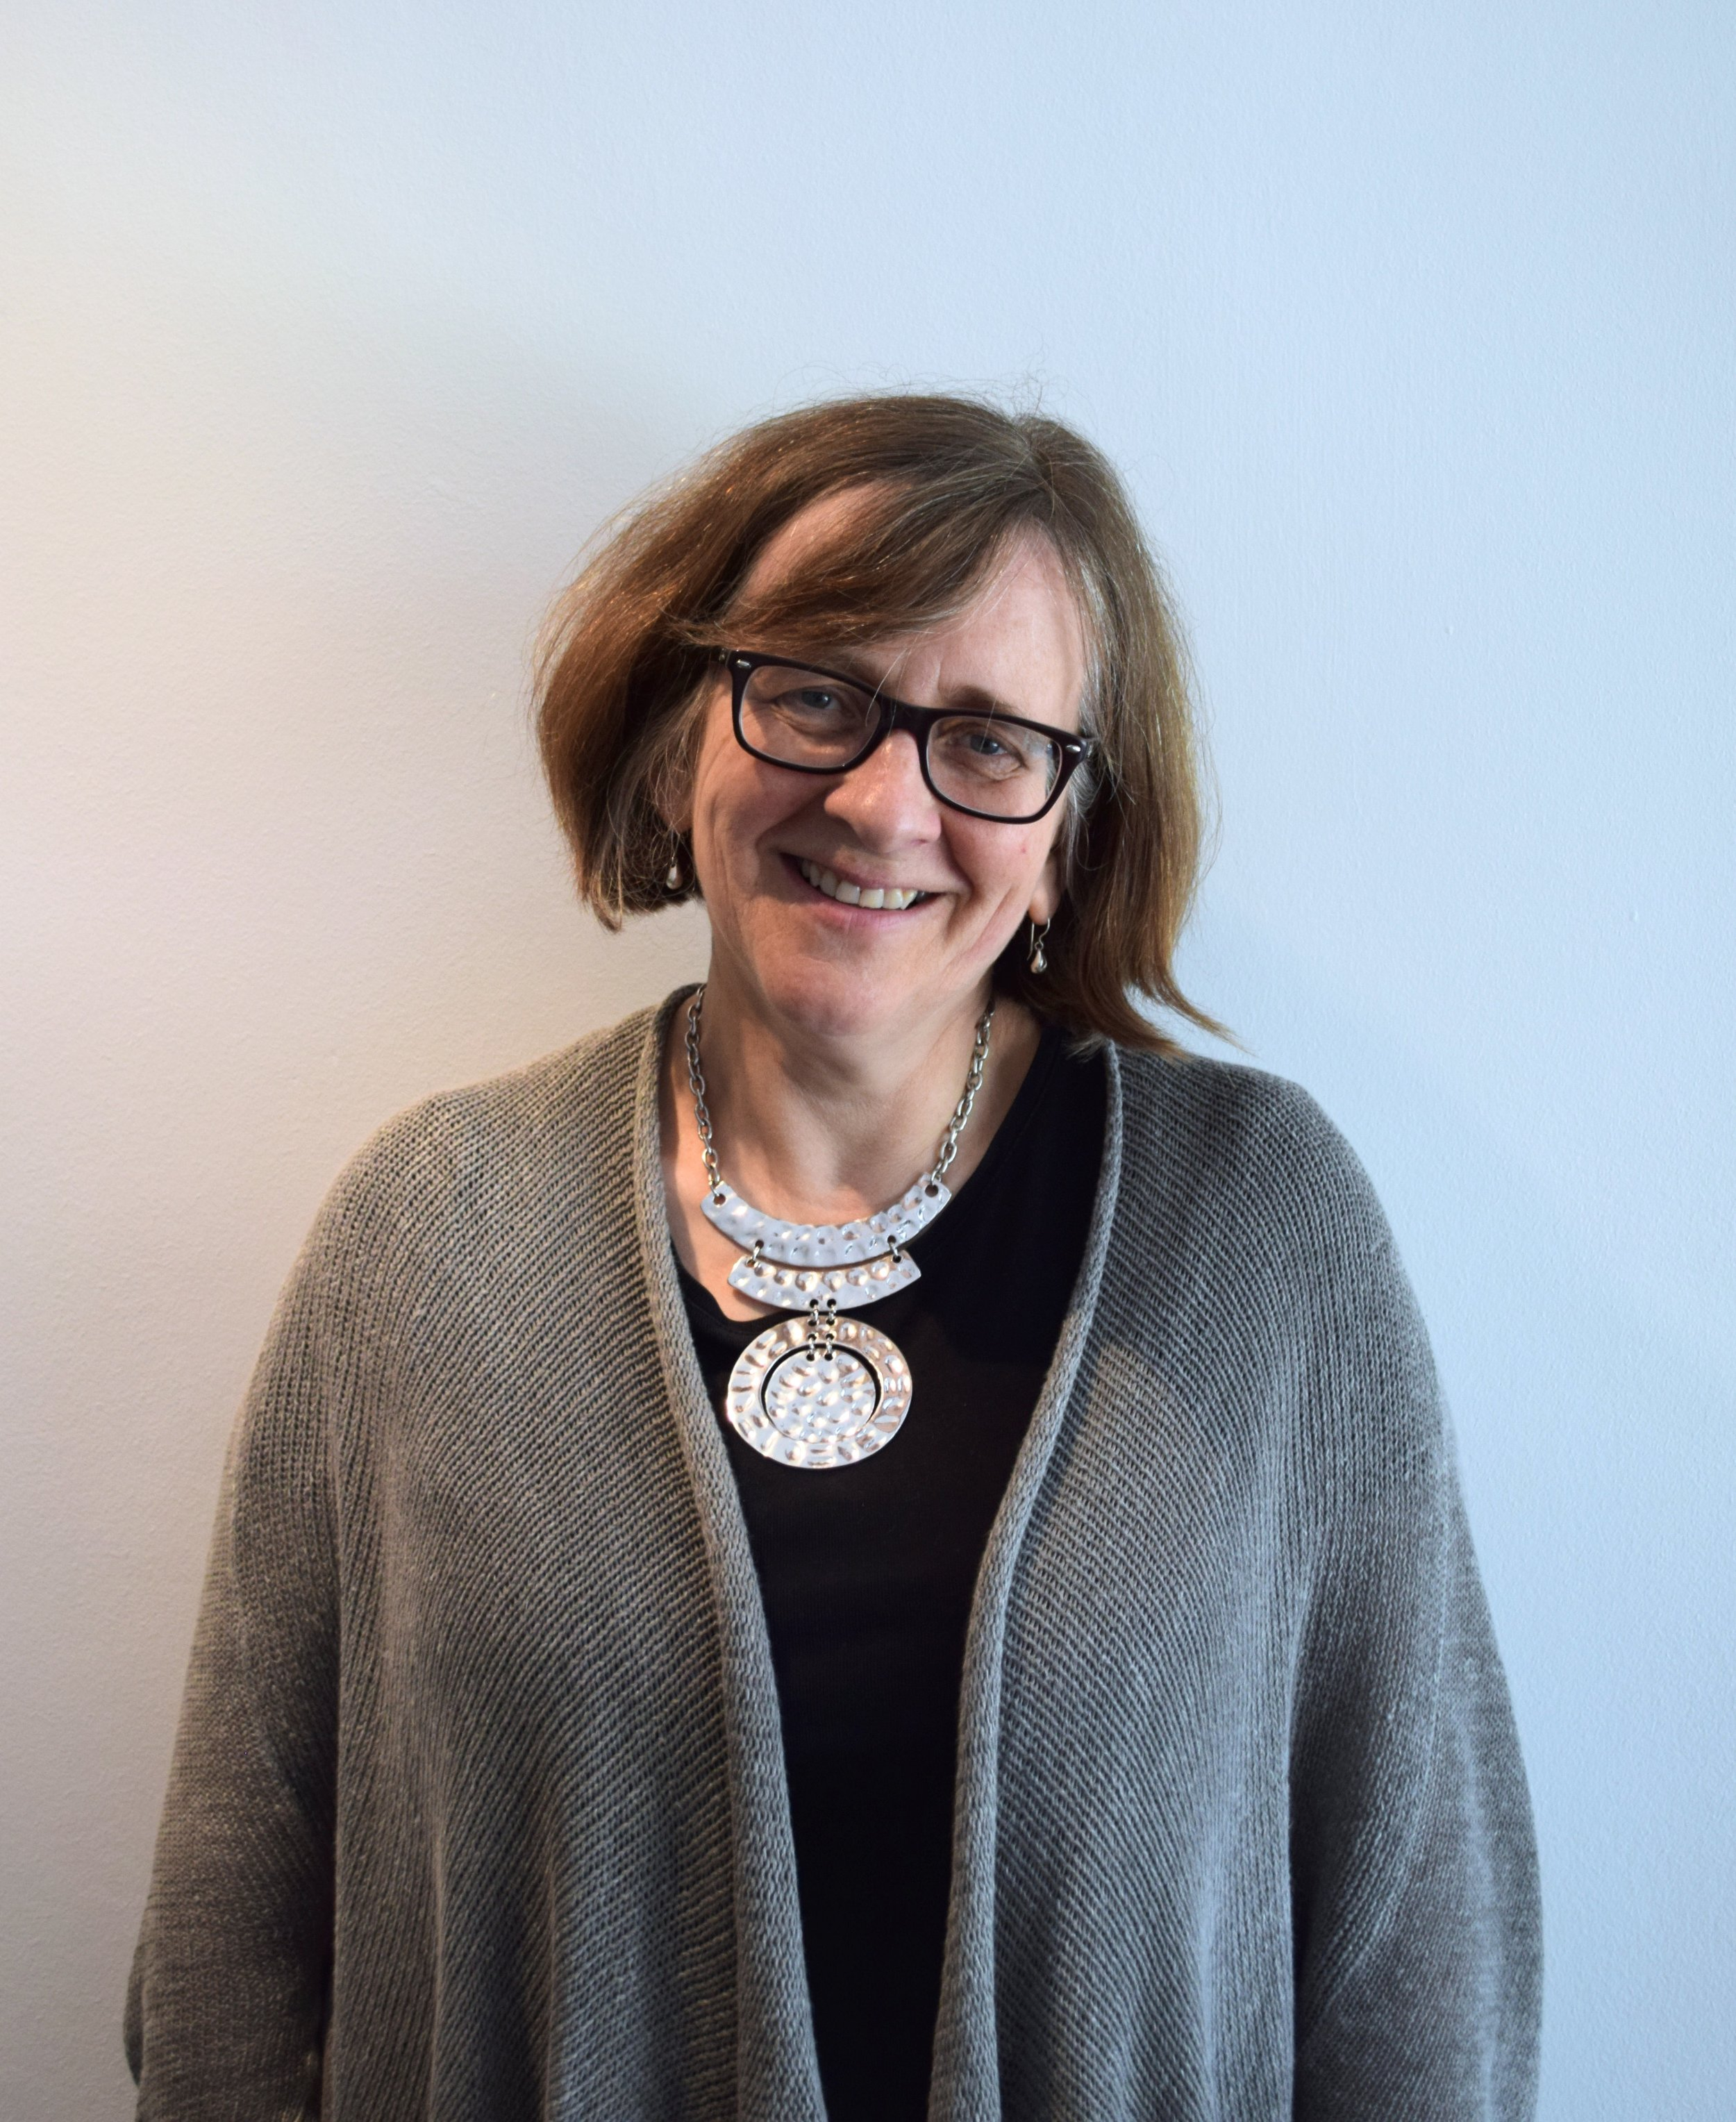 Ruth Hayes - Treasurer and Children's Champion